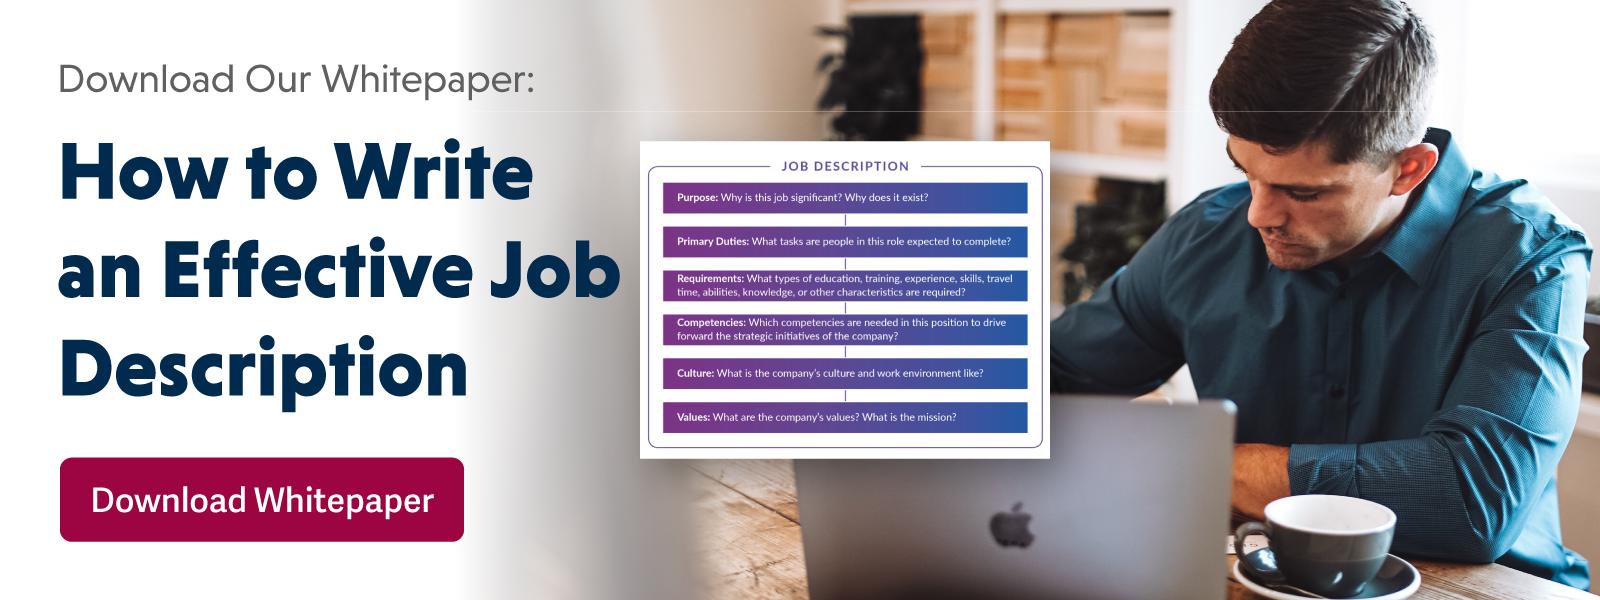 write-an-effective-job-description-cta